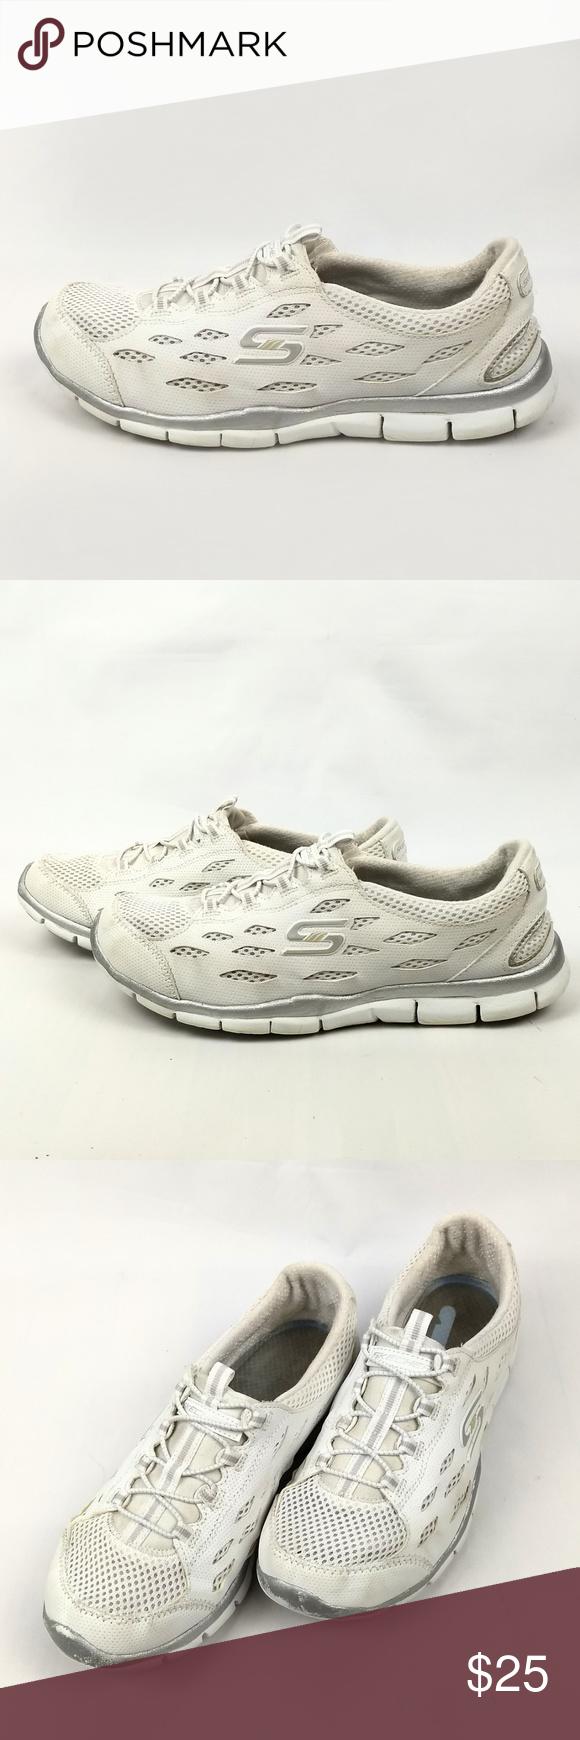 Memory Foam Sneakers Textile Upper